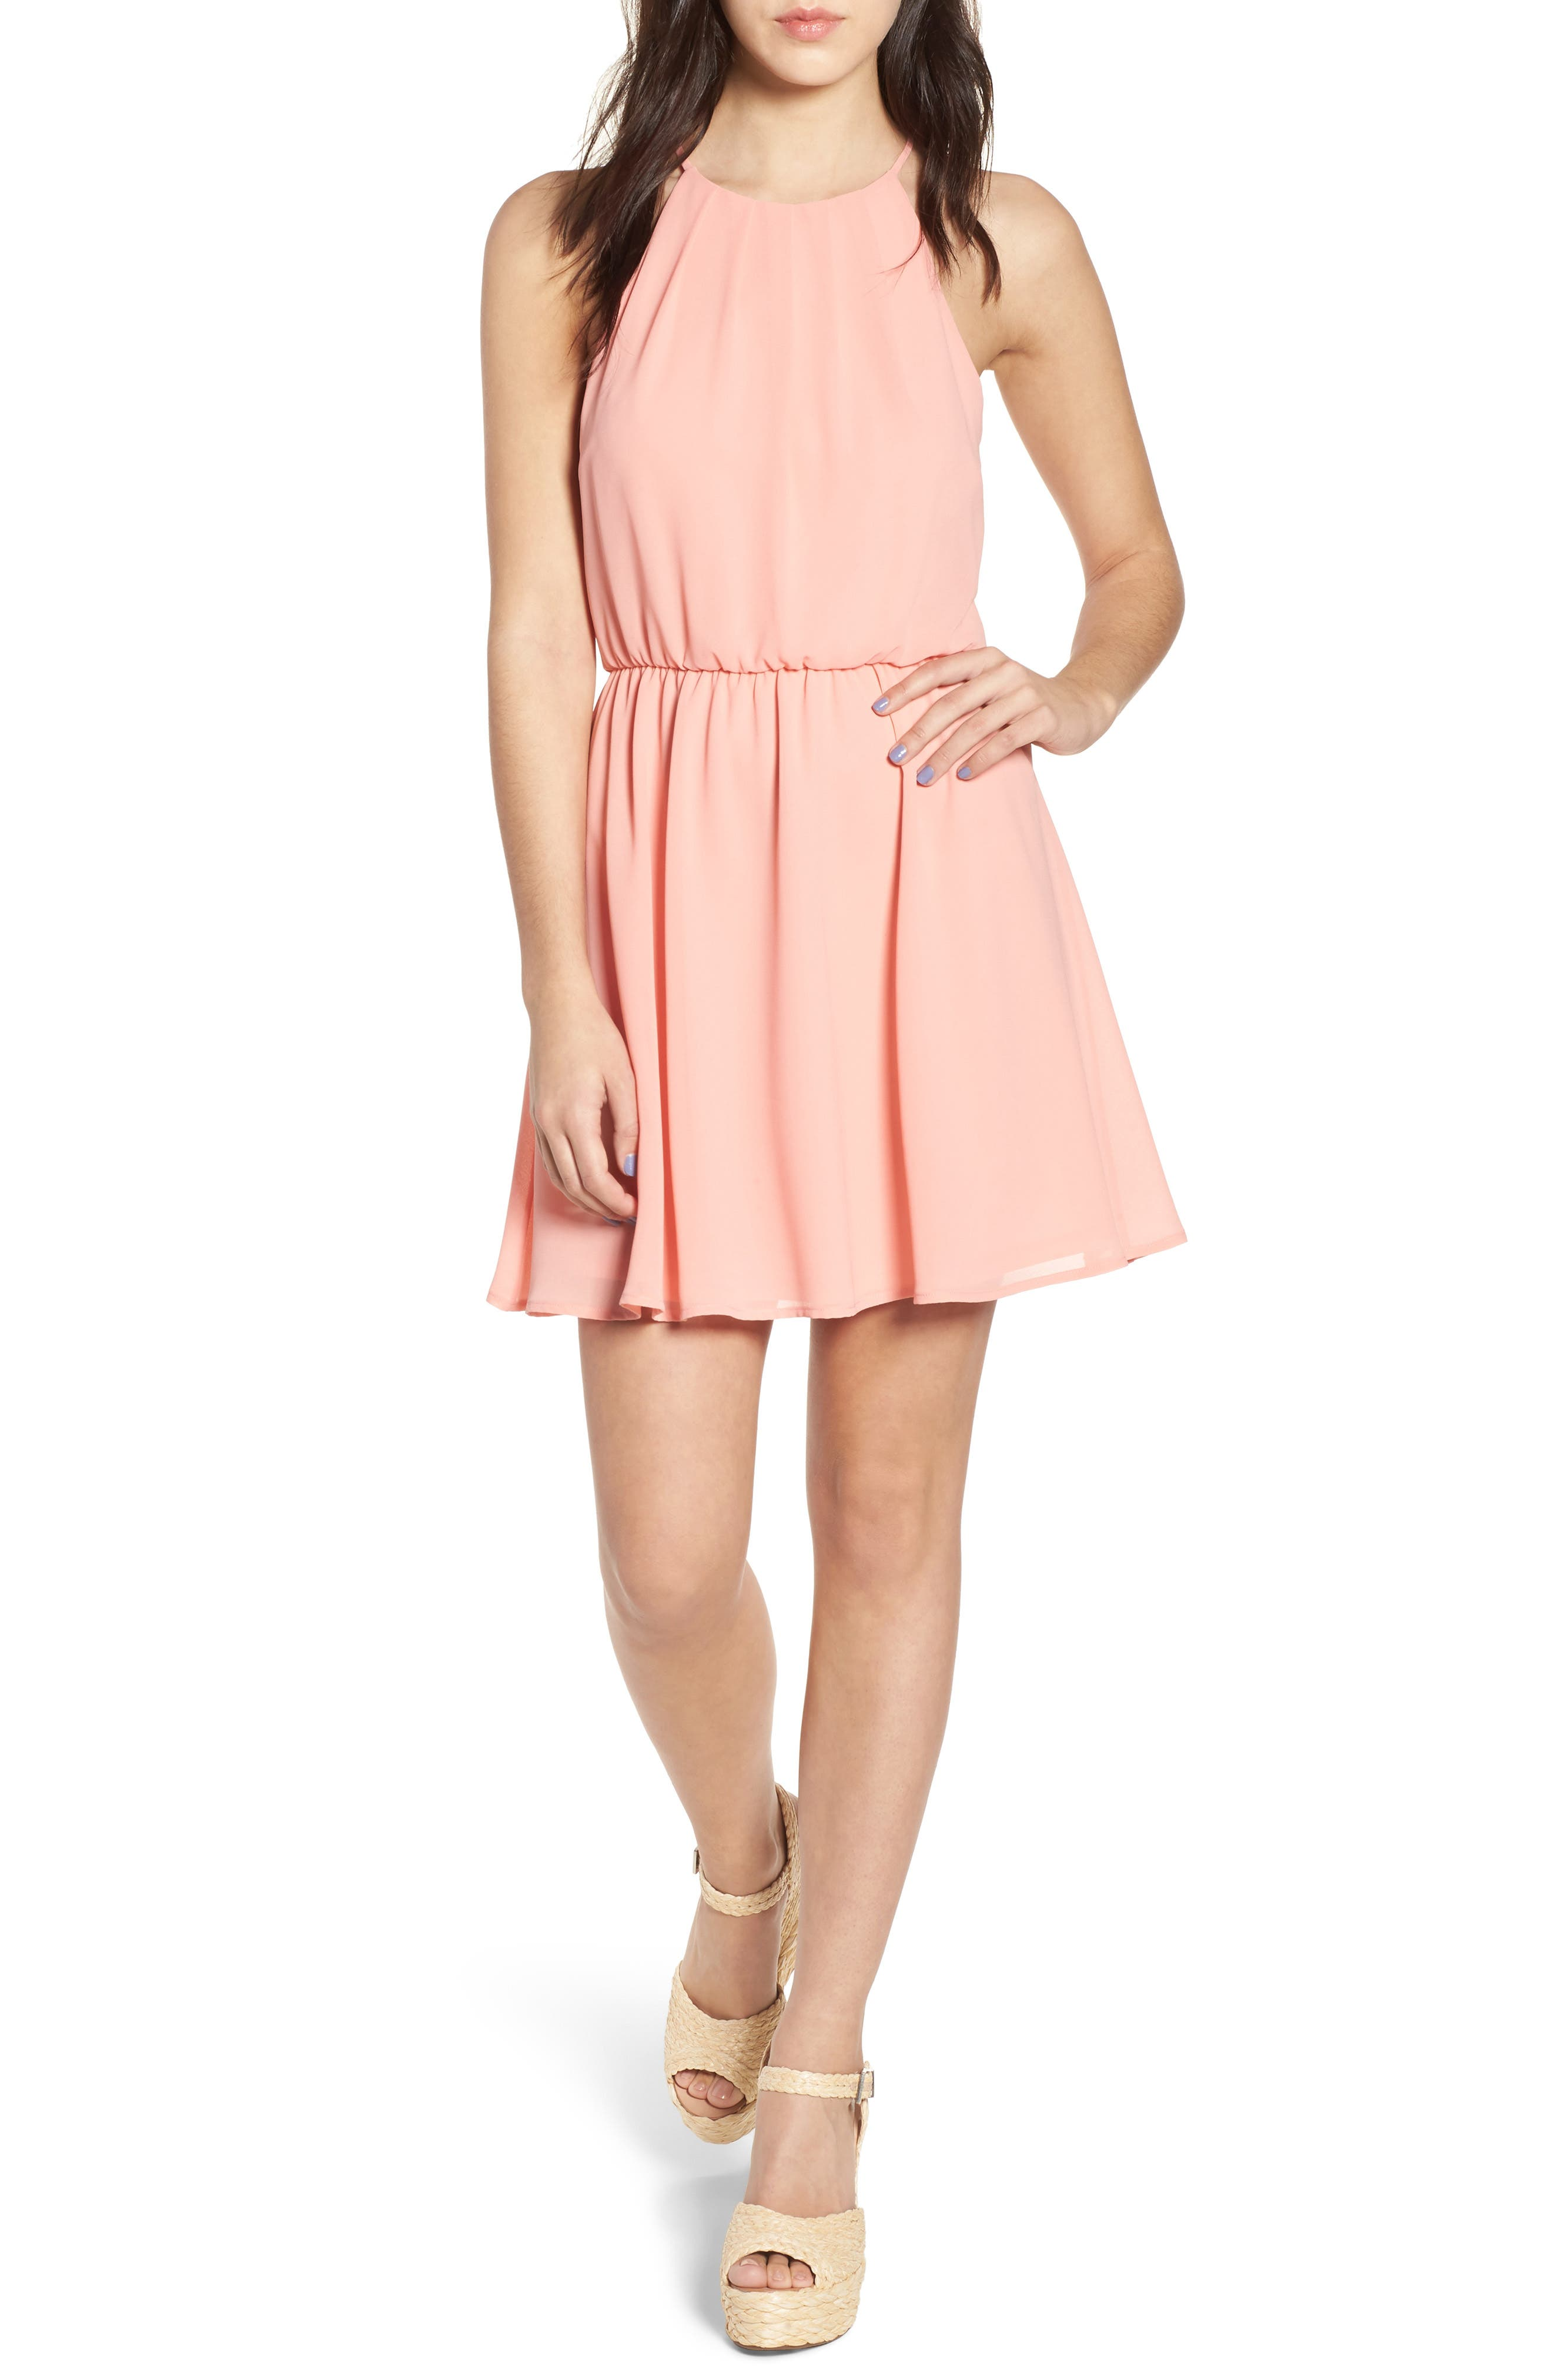 Blouson Chiffon Skater Dress,                             Main thumbnail 1, color,                             Peach